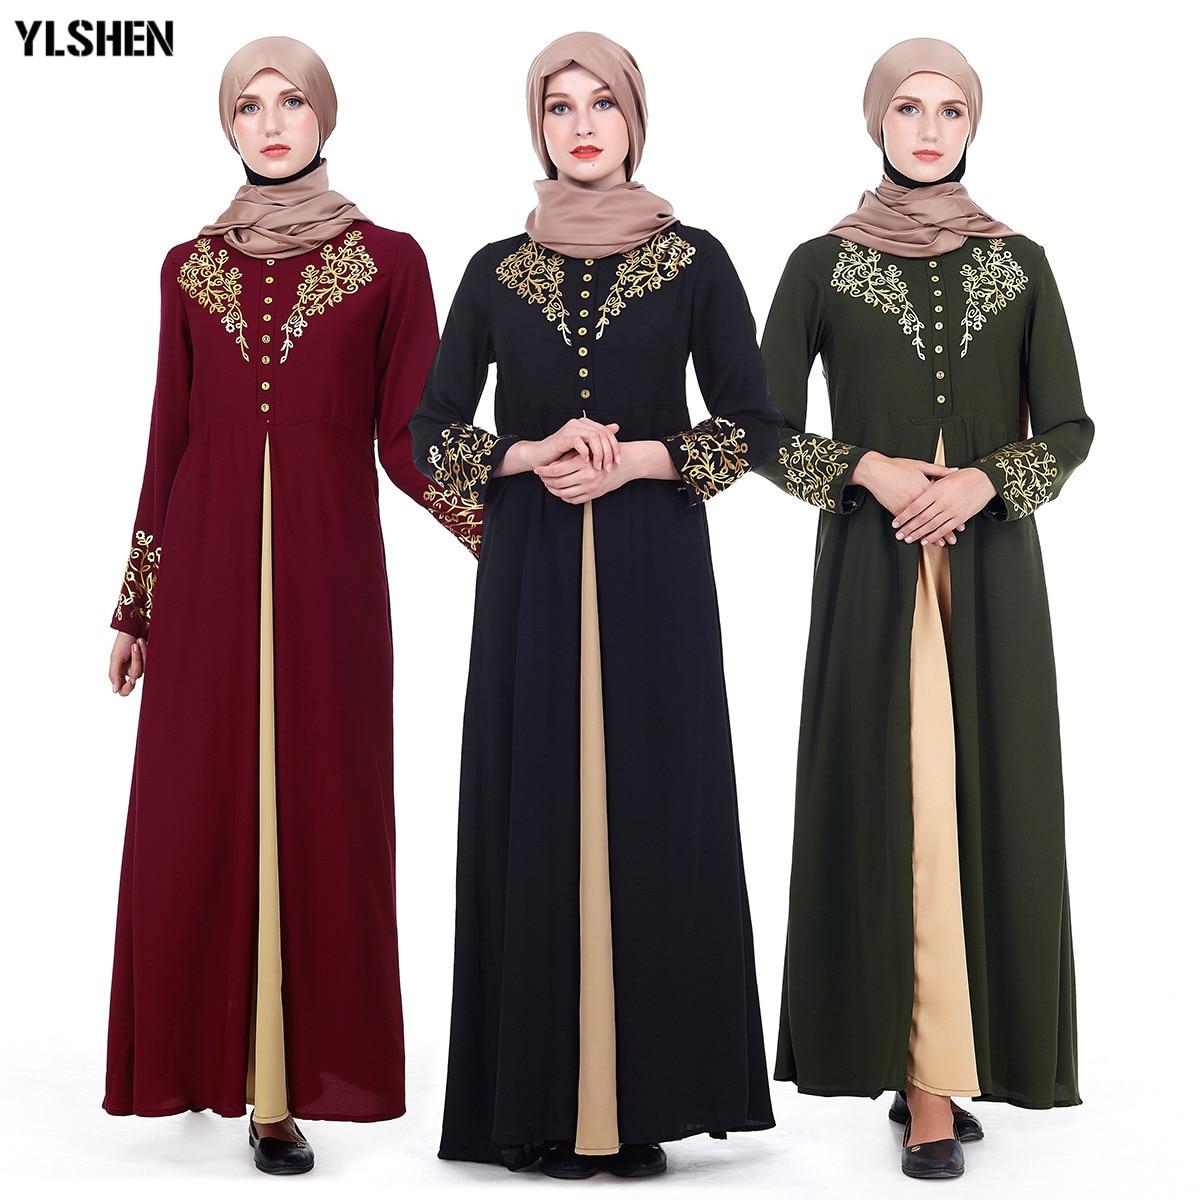 Plus Size Muslim Abaya Dubai Women Maxi Dresses Ramadan Moslim Prayer Robe Hijab Dress Kaftan Islamic Turkey Islamic Clothing